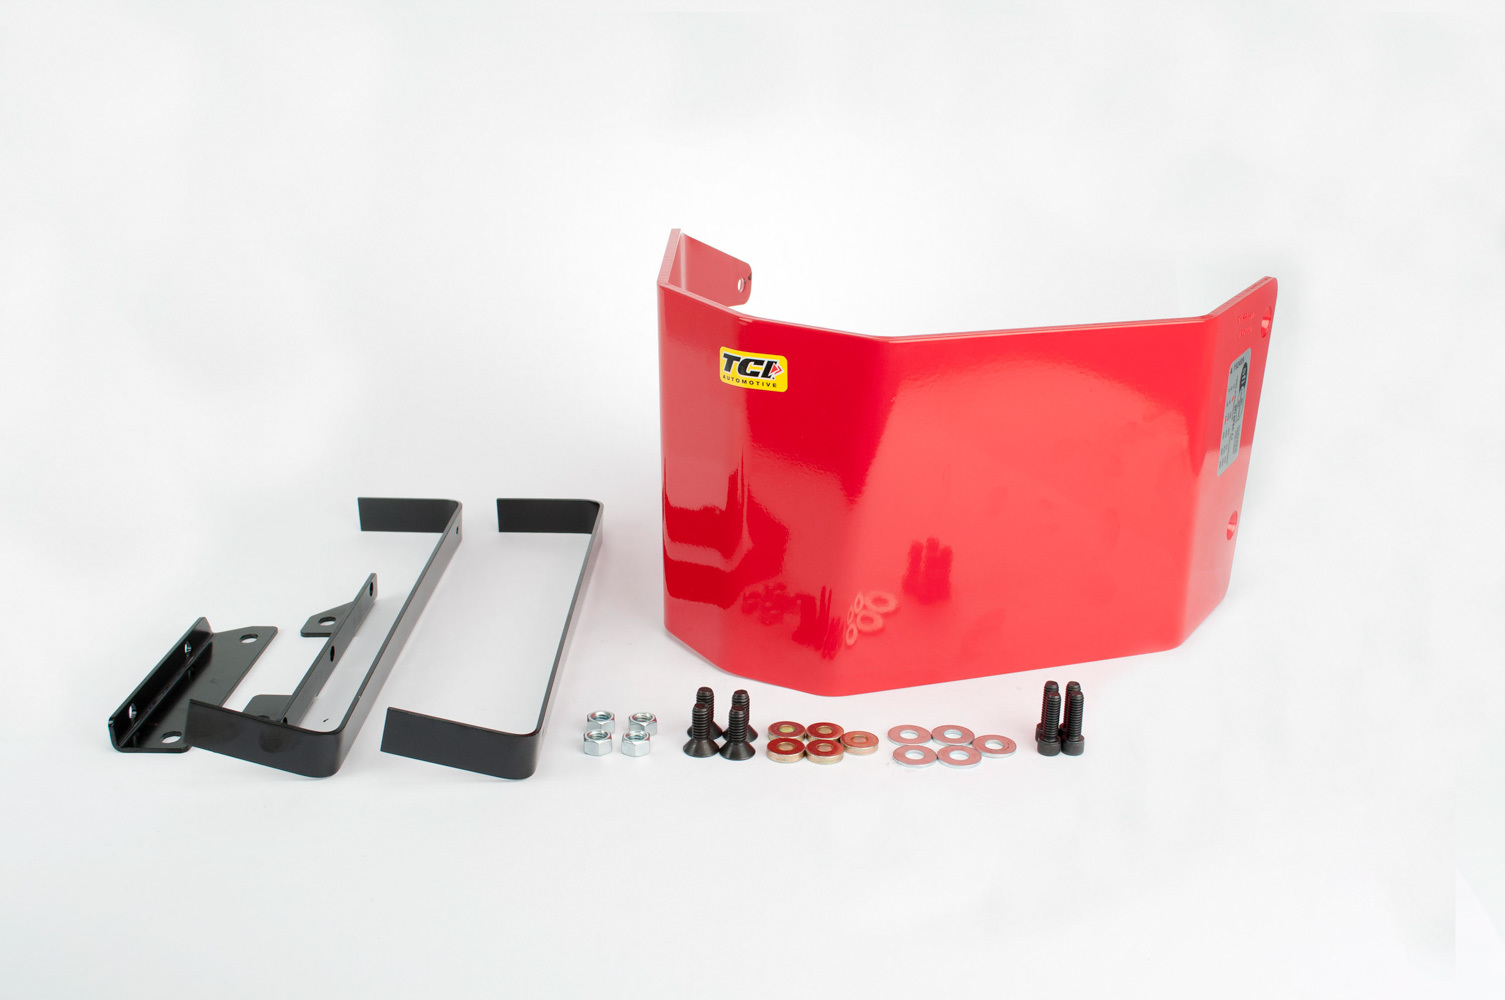 Tci Th400 Trans Shield (Red)